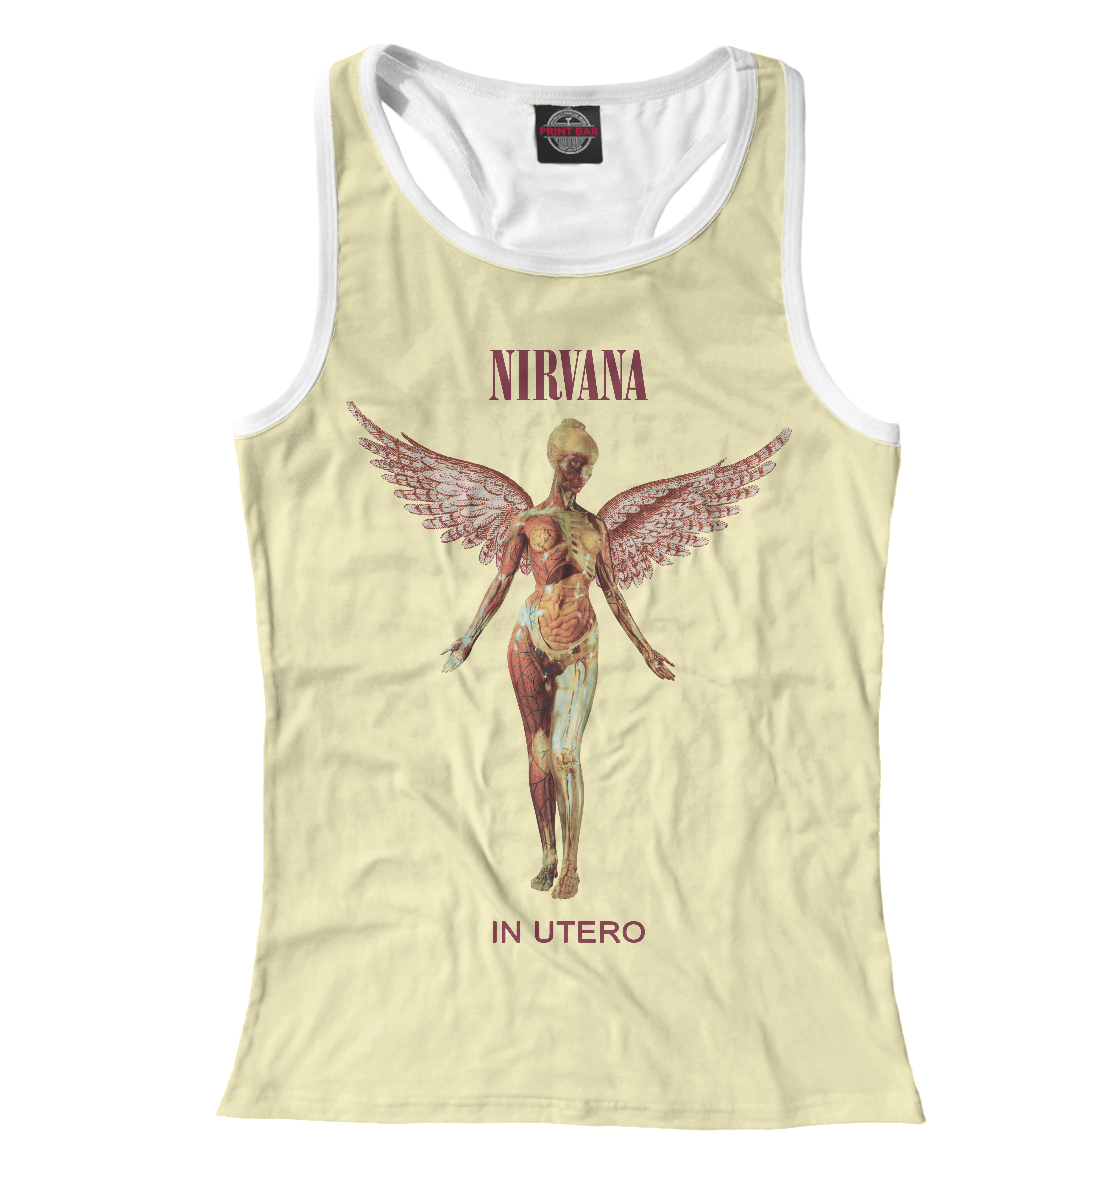 Nirvana (In Utero) футболка стрэйч printio nirvana in utero t shirt